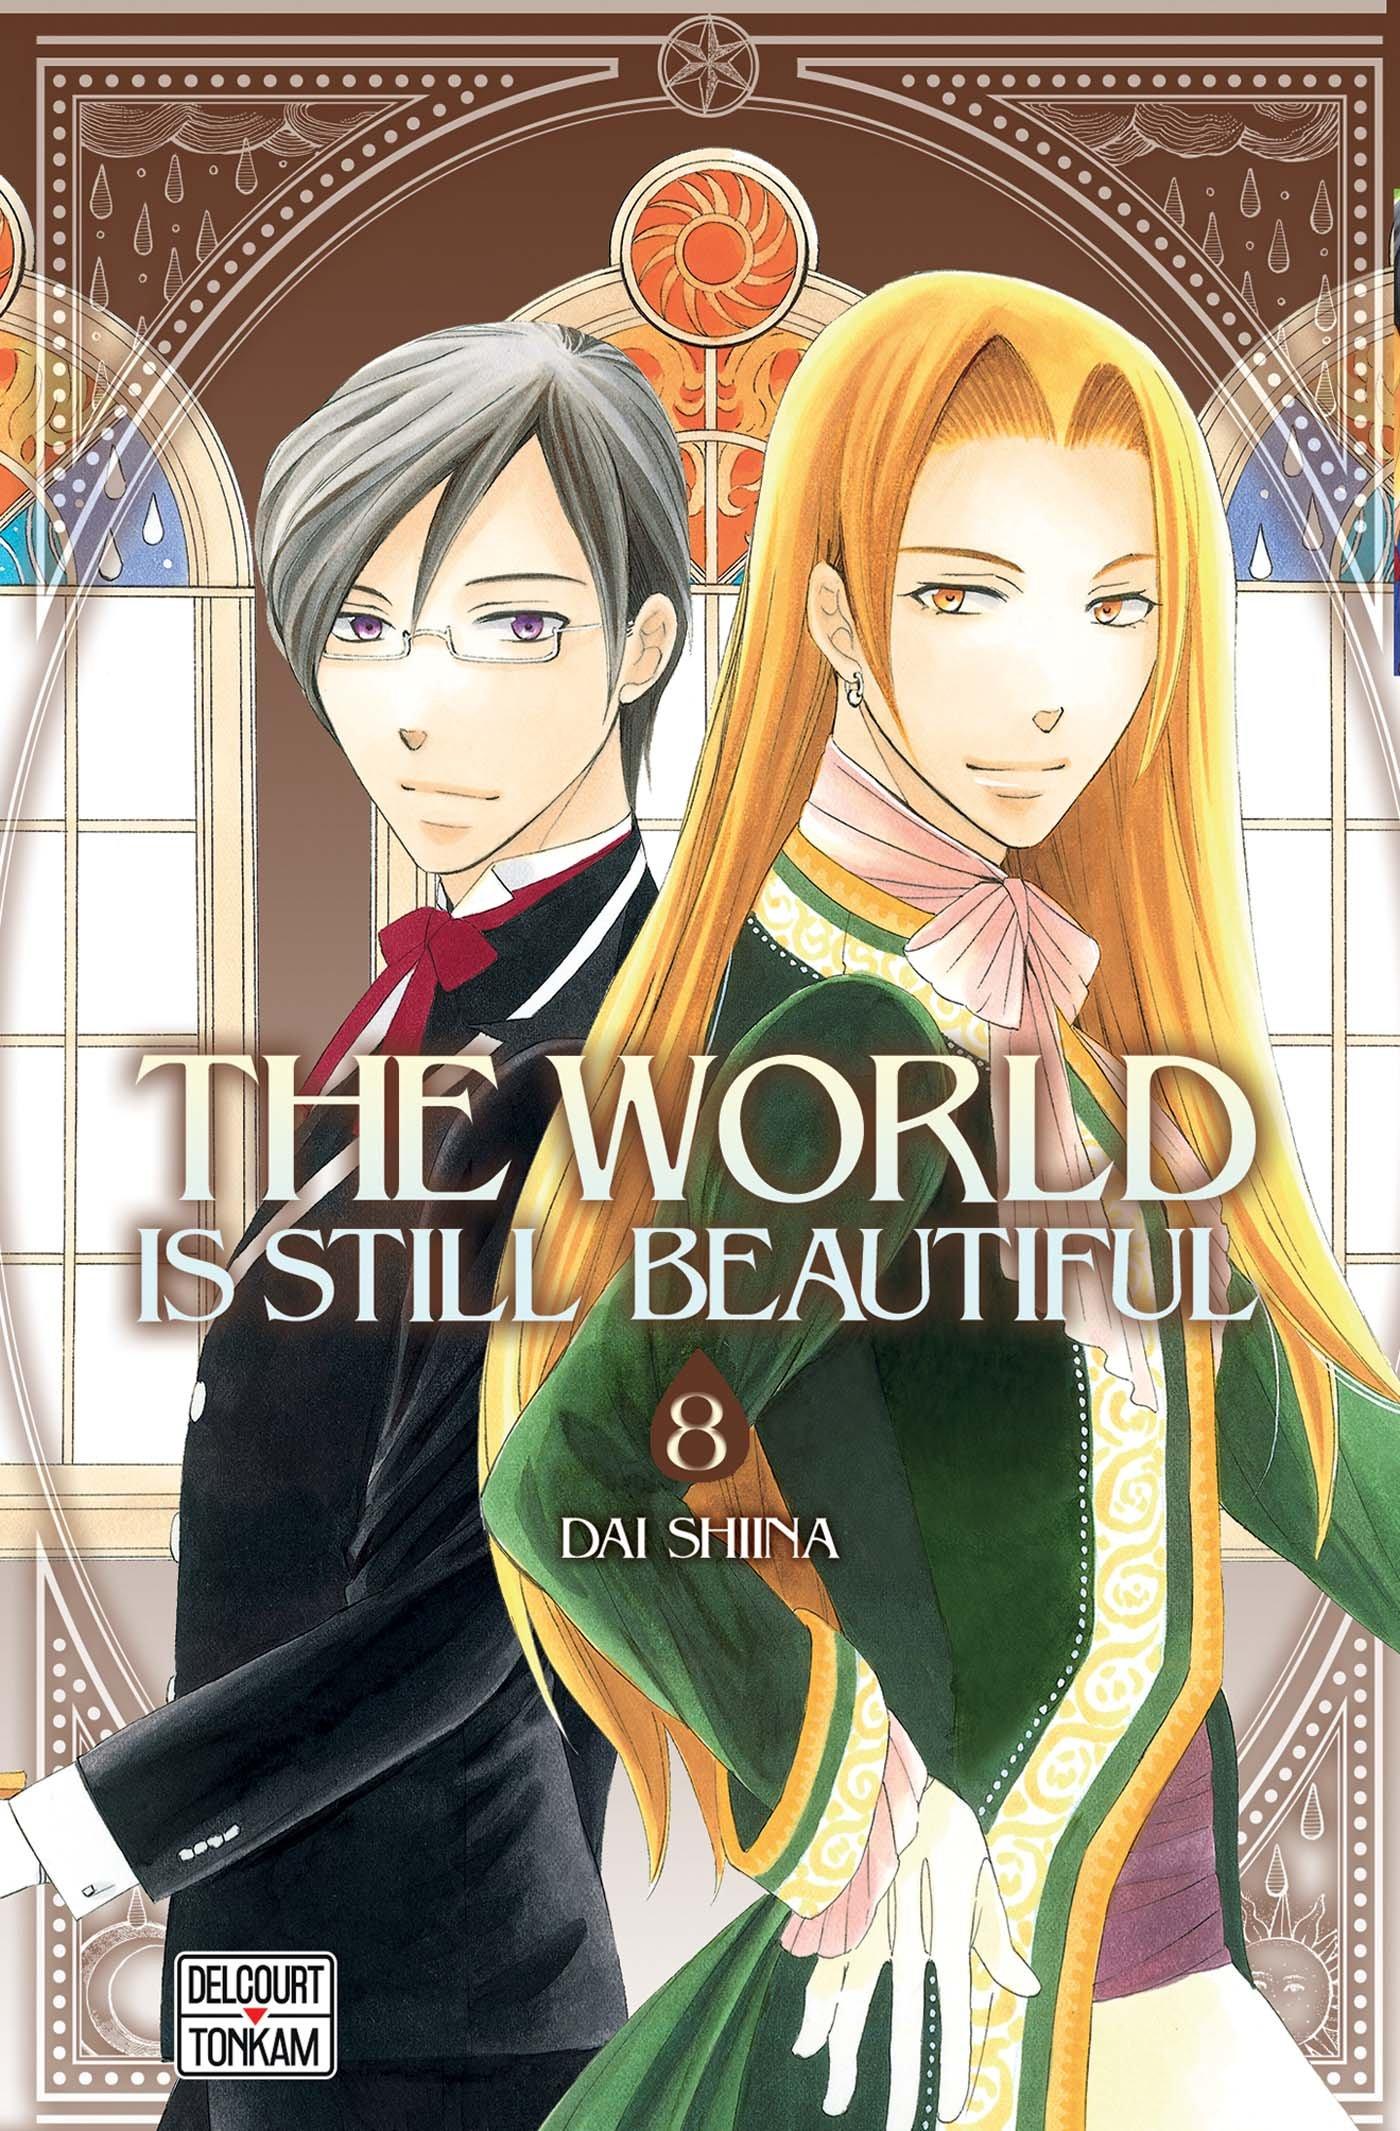 The World is still beautiful 8